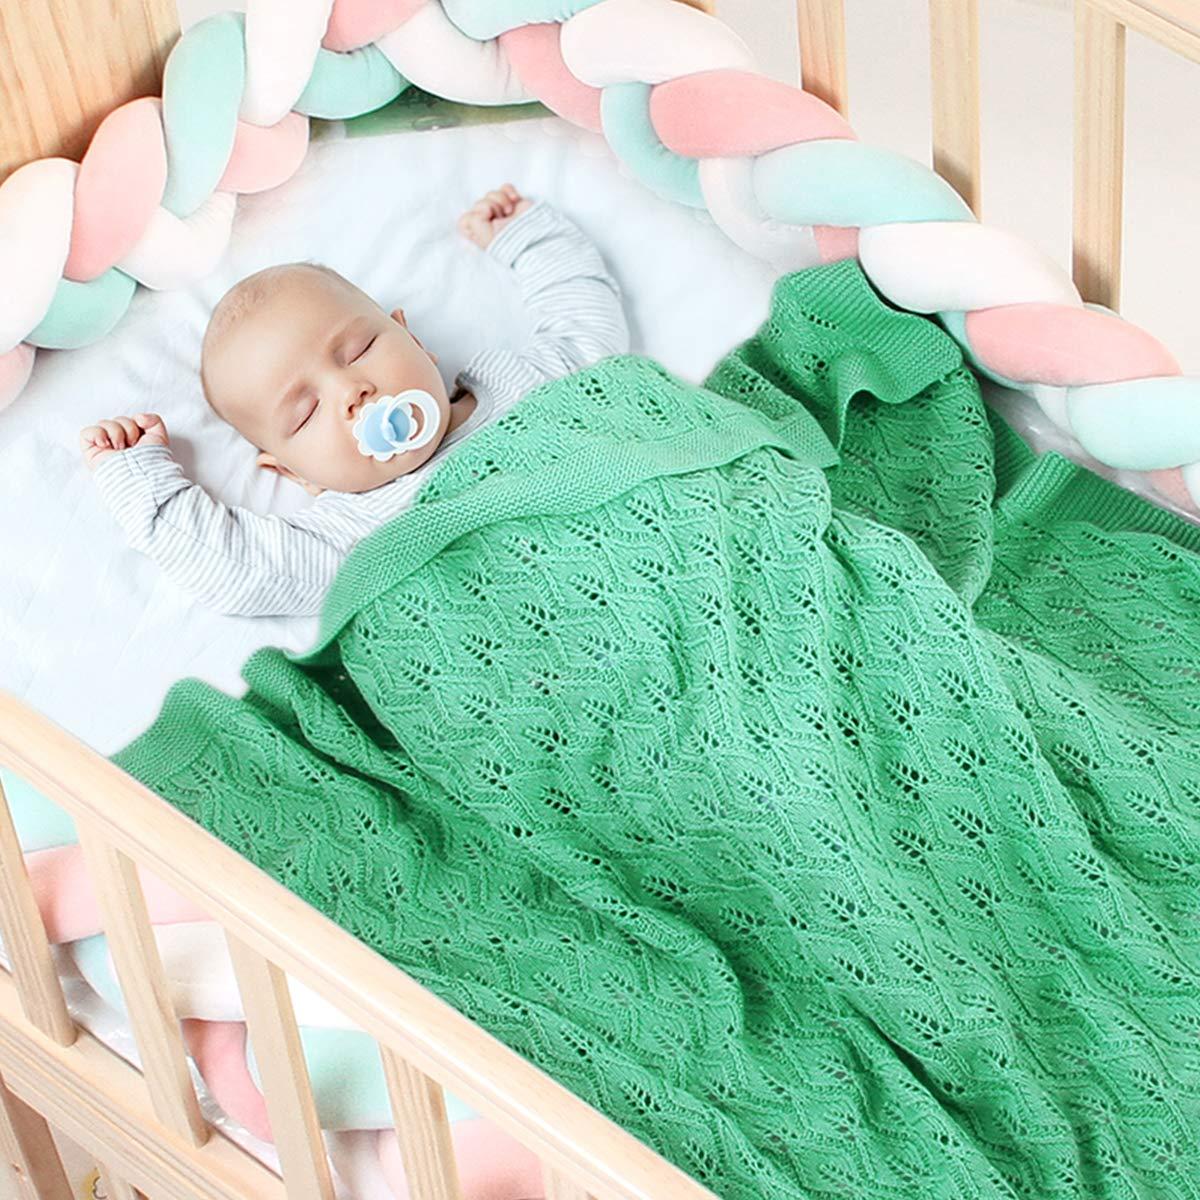 Owlike Newborn Baby Boys Girls Blanket Hollow-Out Leaves Knitted Swaddle Blanket,Toddler Knitted Crochet Throw Blanket -Grape Green